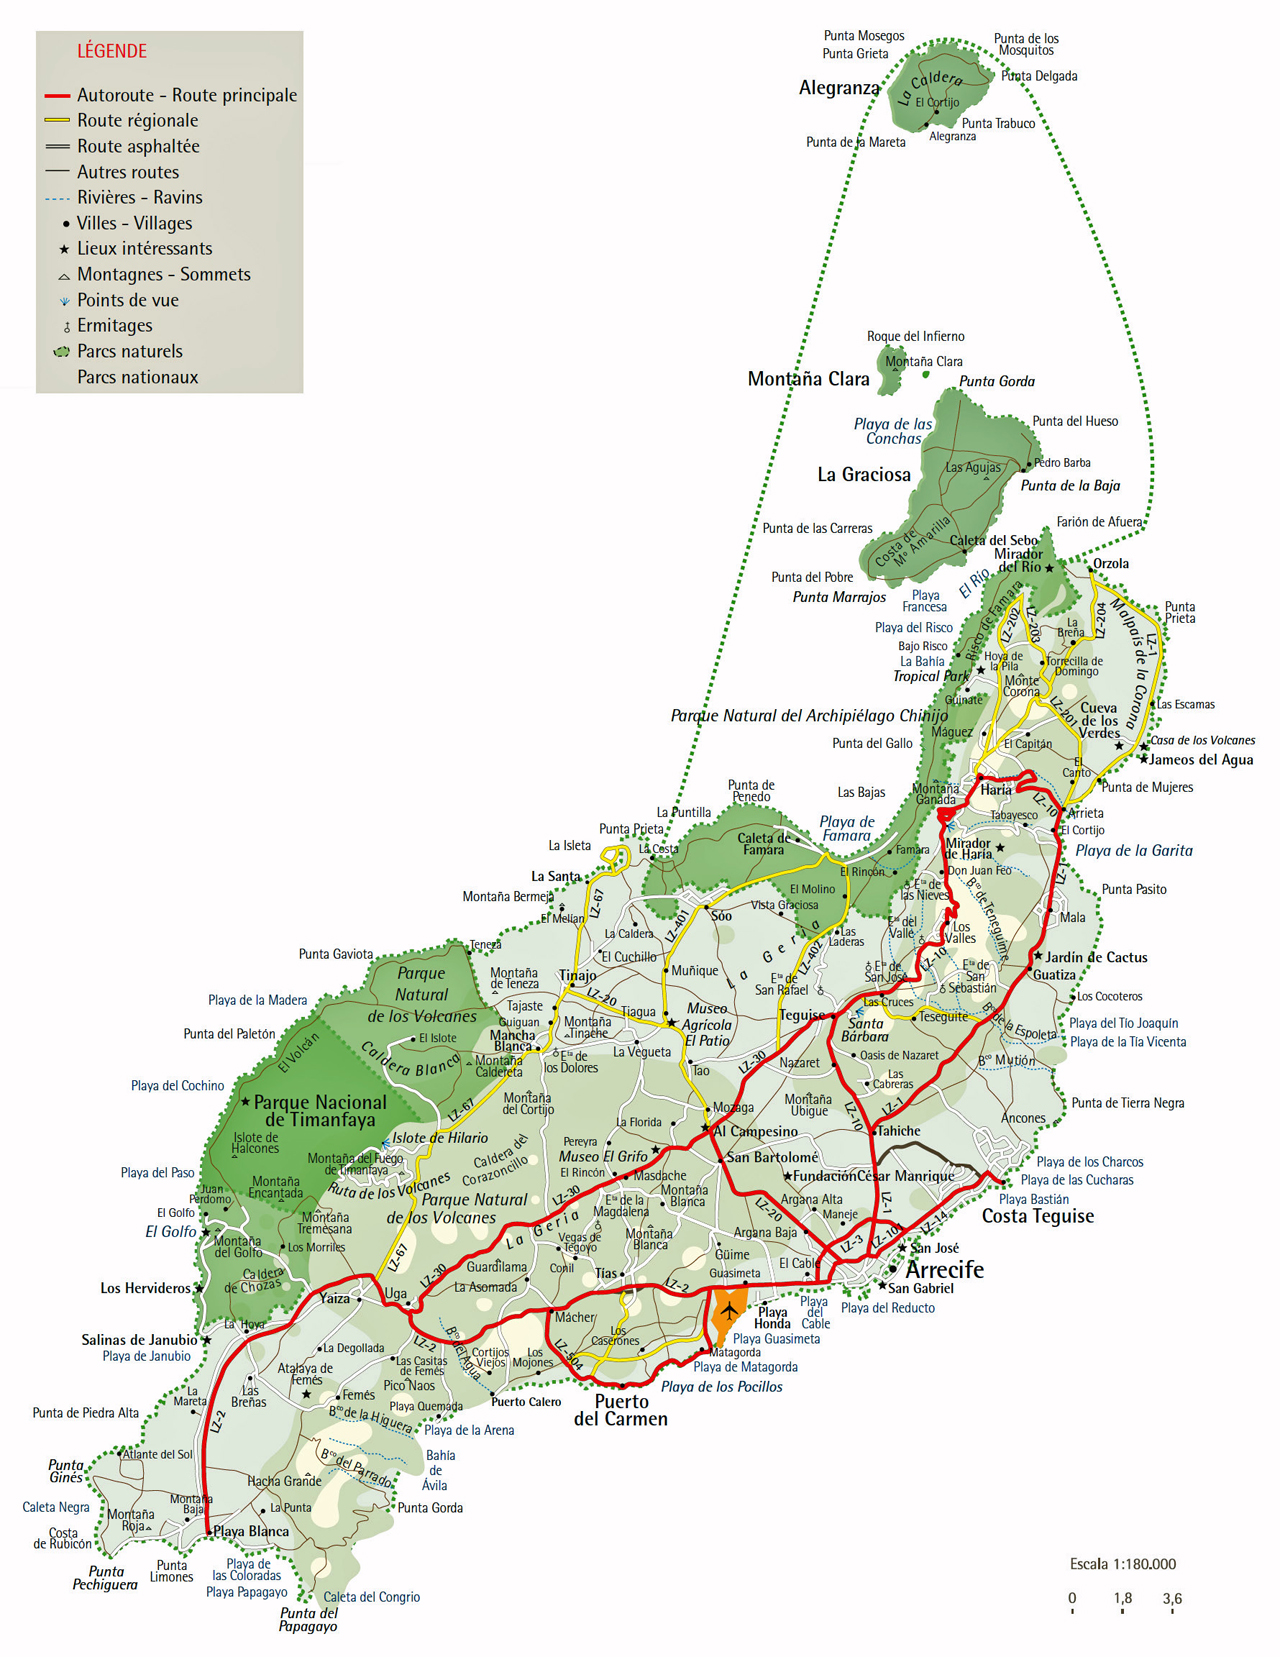 karte lanzarote Interaktive Karte der Insel Lanzarote karte lanzarote